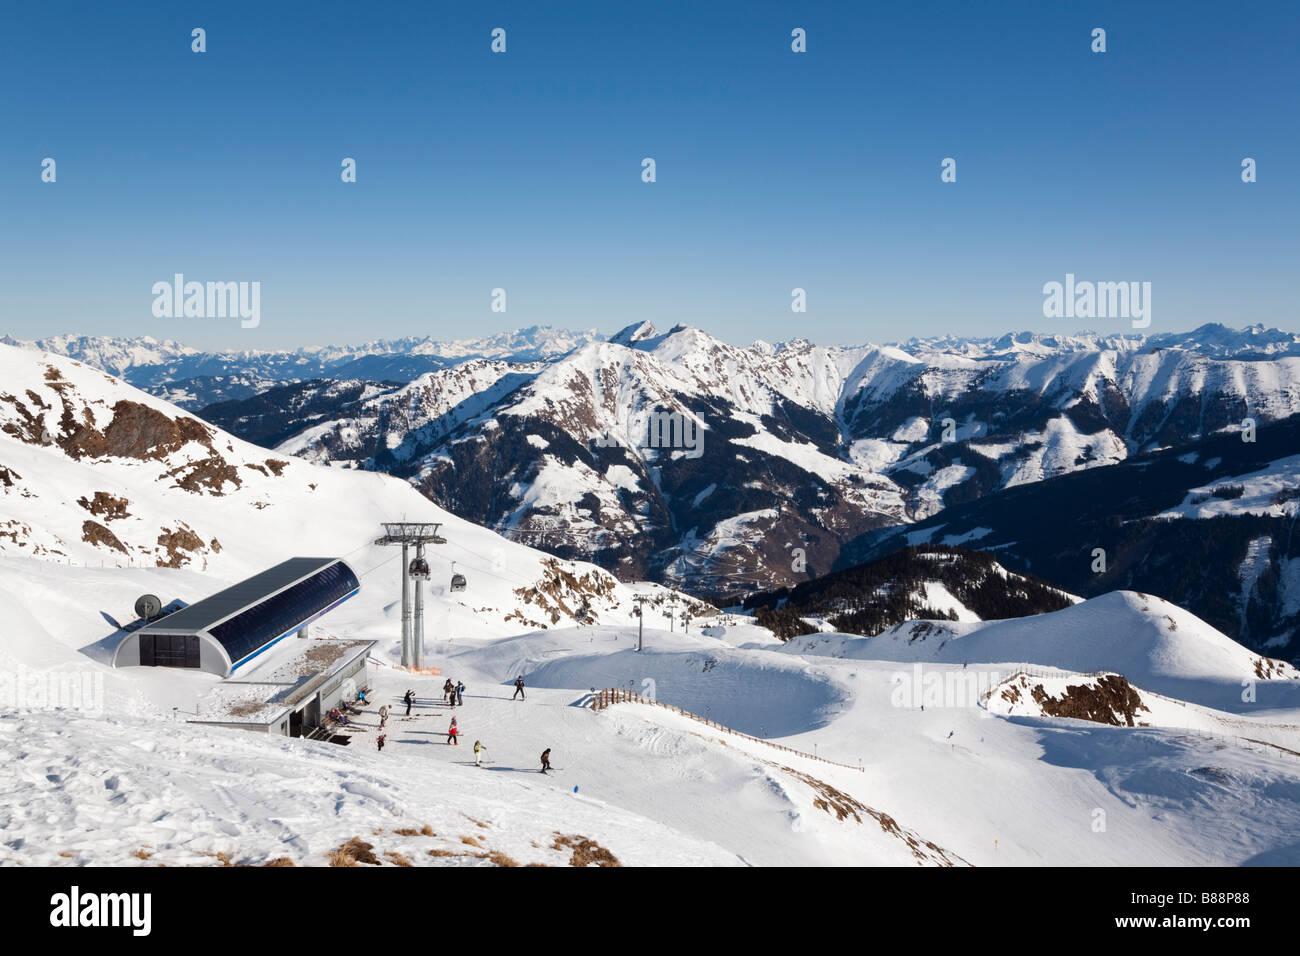 View above Rauriser Hochalmbahnen ski slopes with skiers skiing in alpine resort in Austrian Alps in winter. Rauris - Stock Image